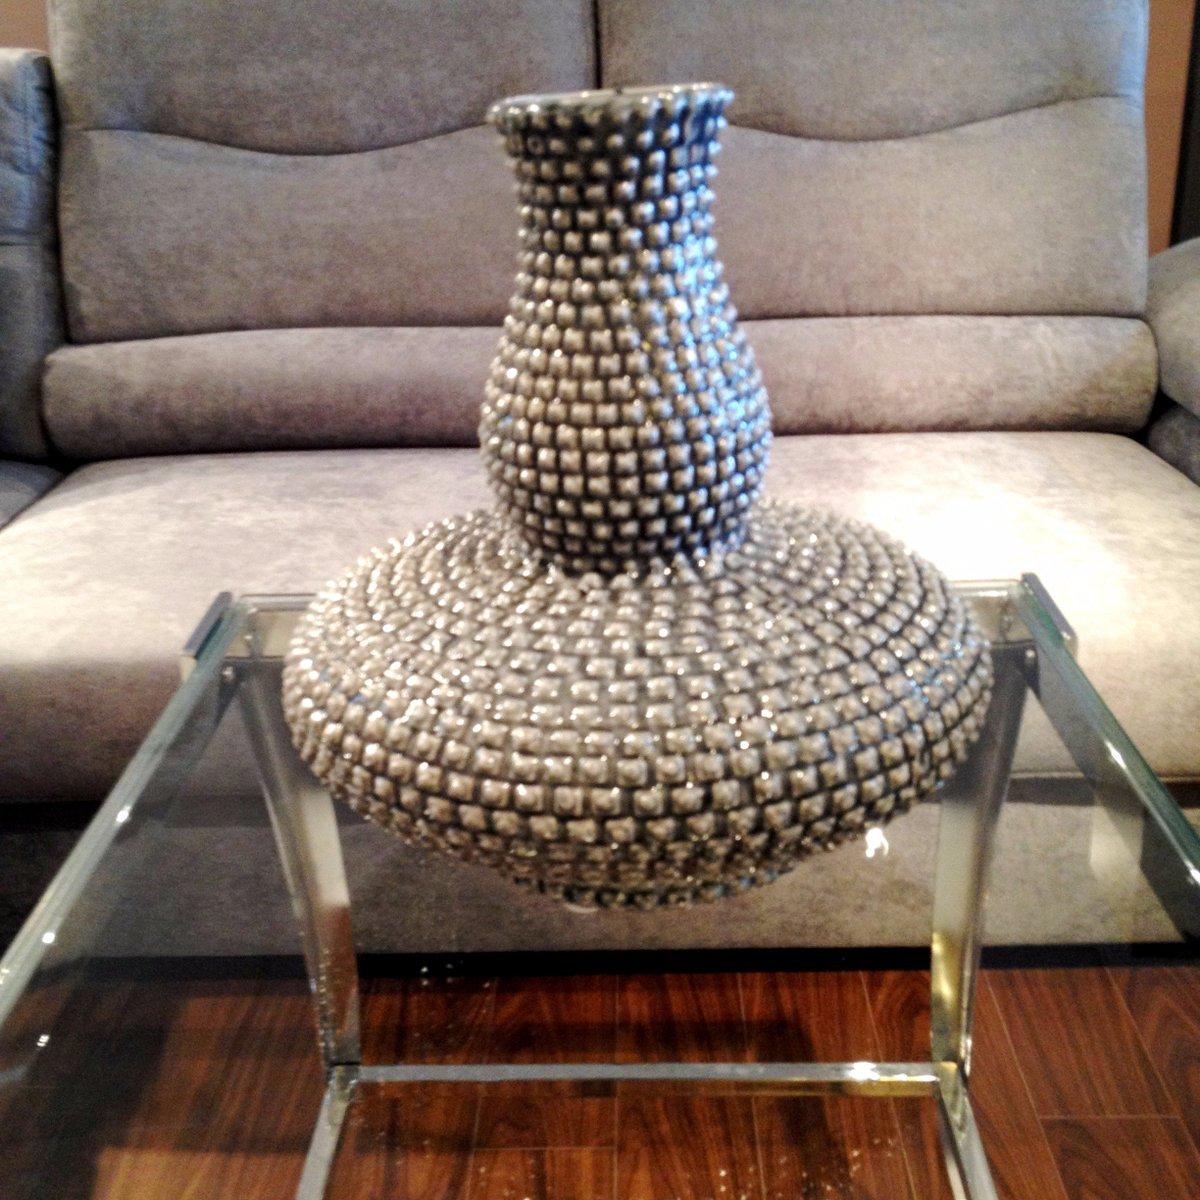 Smart Furniture. Smart Furniture   smrtfurniture    Twitter